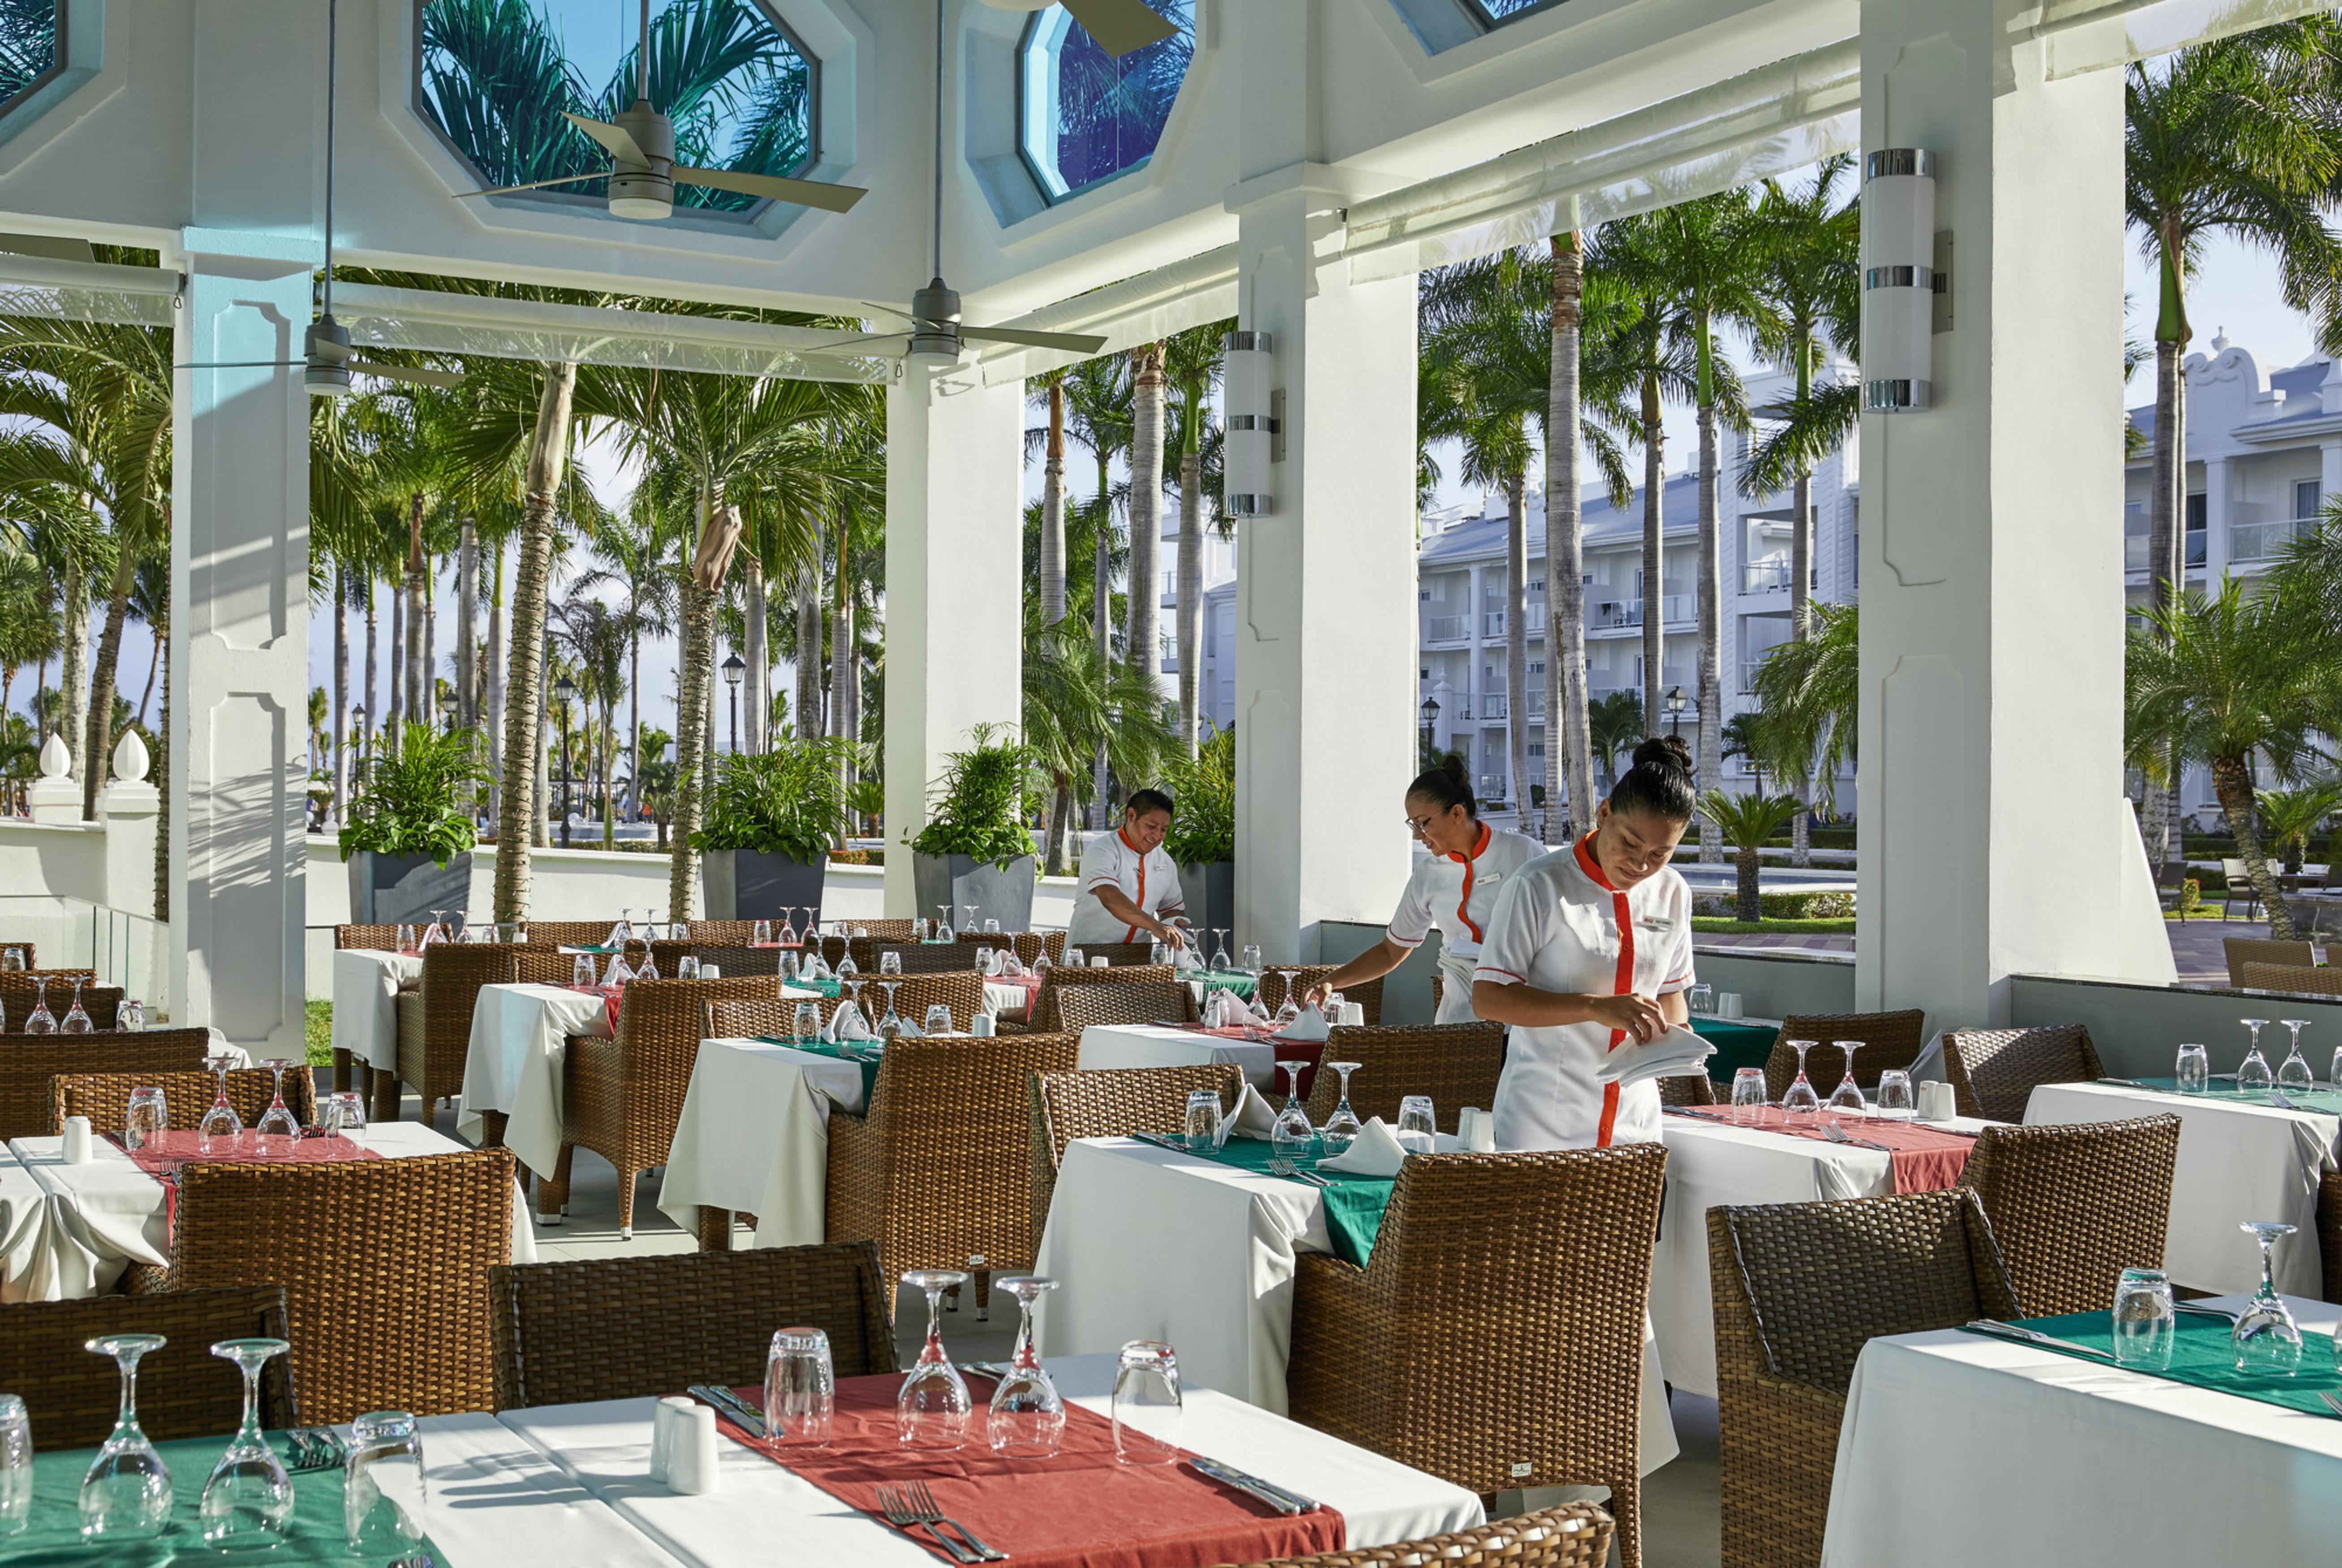 Otro restaurante con terraza / RIU